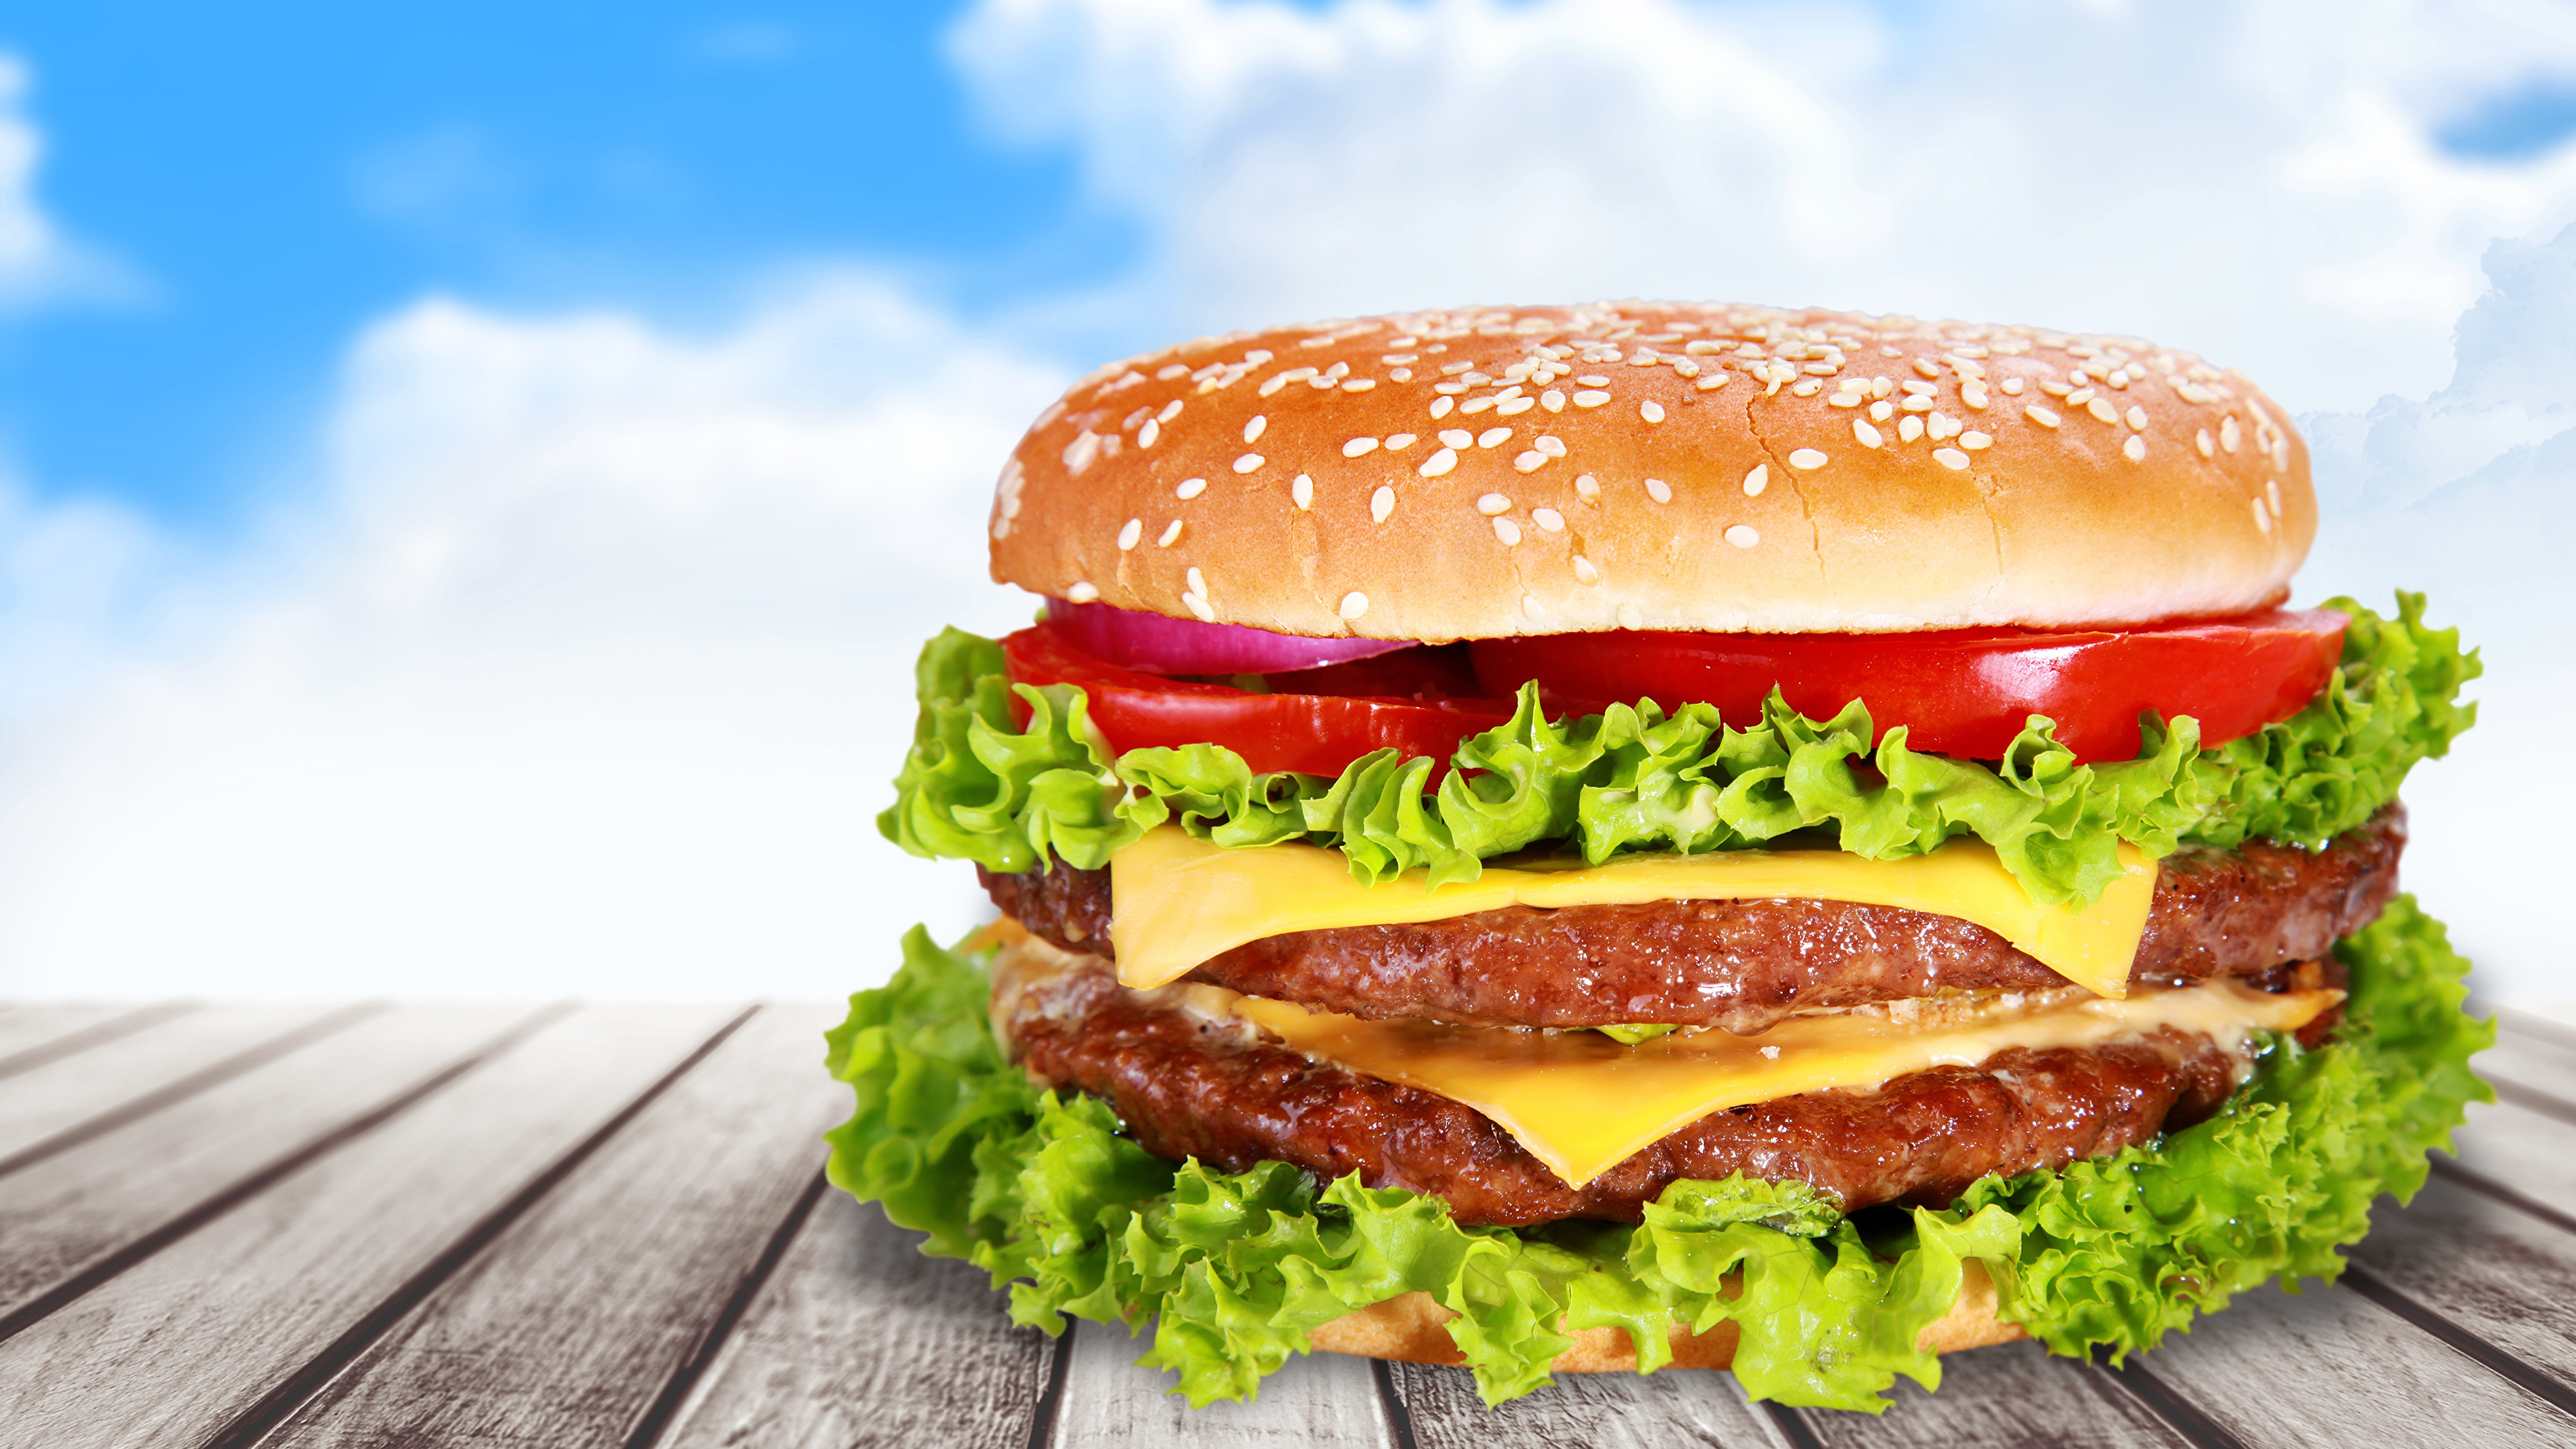 Fotos Hamburger Fast food Gemüse Lebensmittel Bretter 3840x2160 Burger